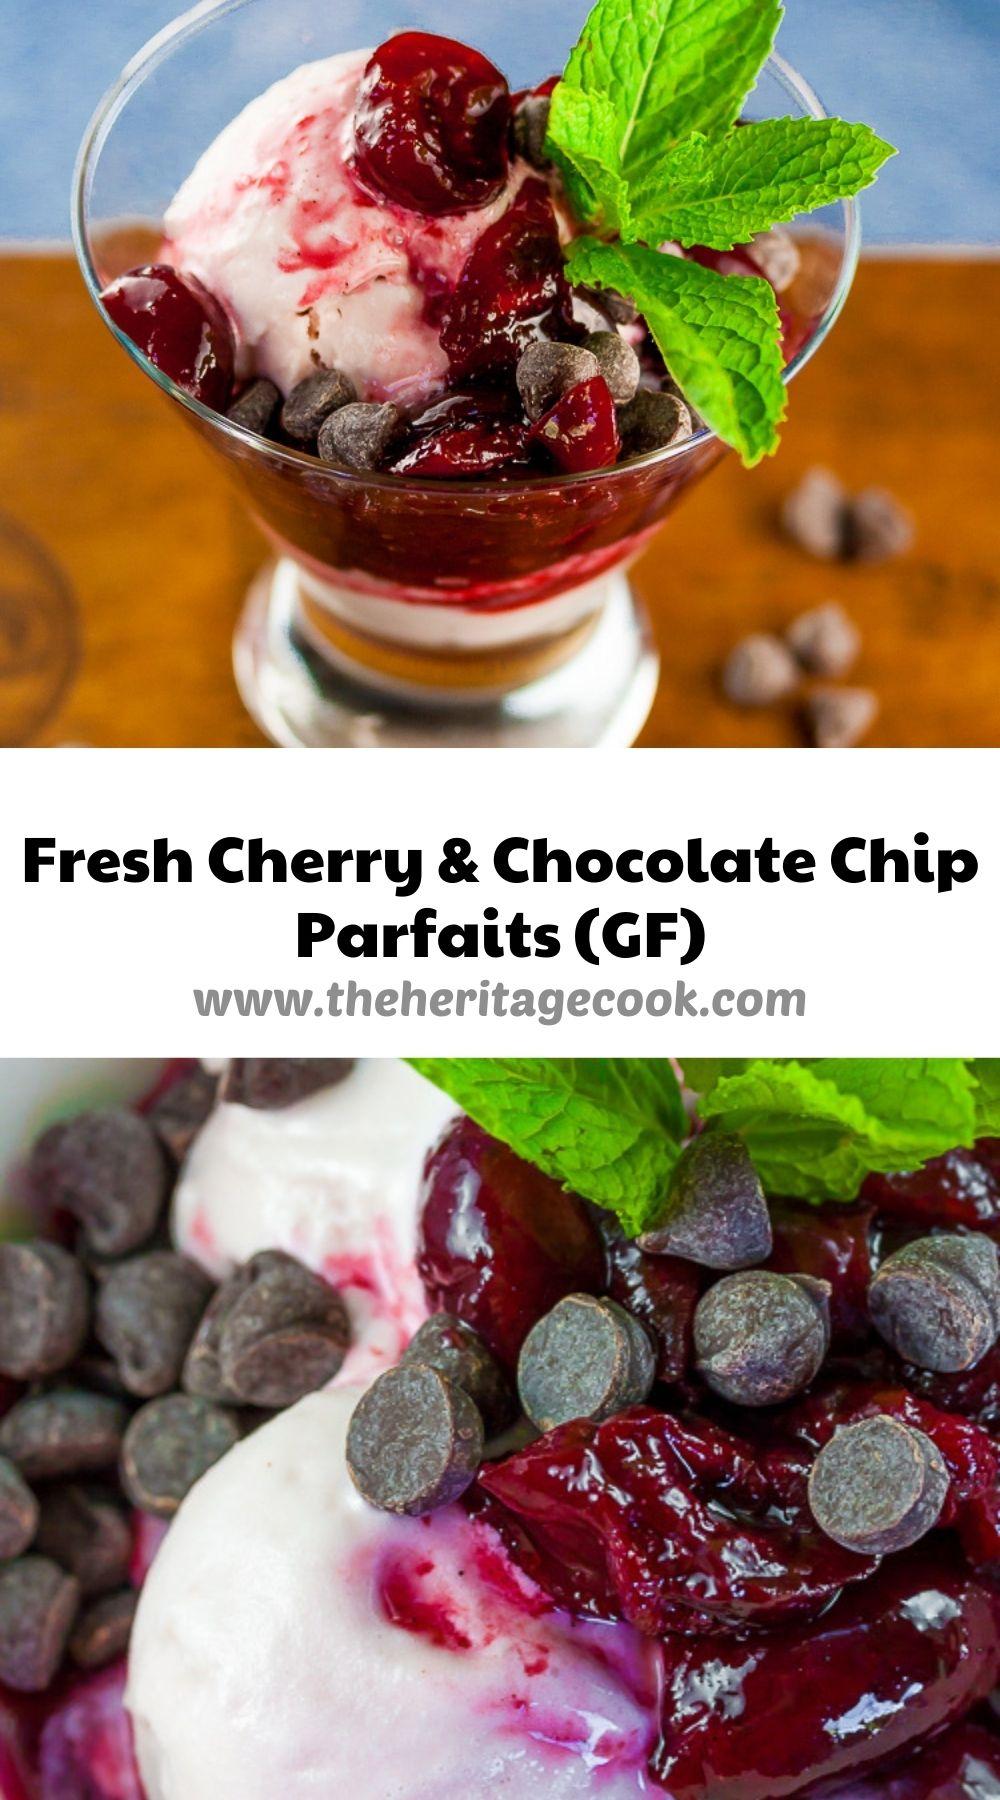 Fresh Cherry and Chocolate Chip Parfaits © 2021 Jane Bonacci, The Heritage Cook